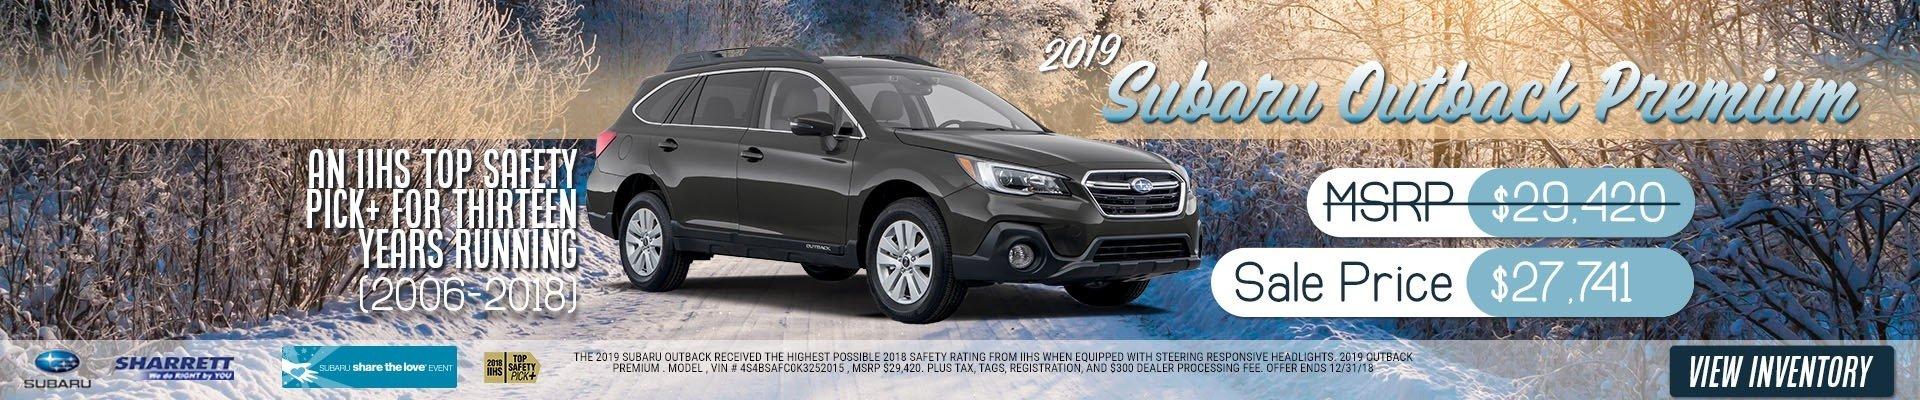 2019 Subaru Outback Premium for $27,741